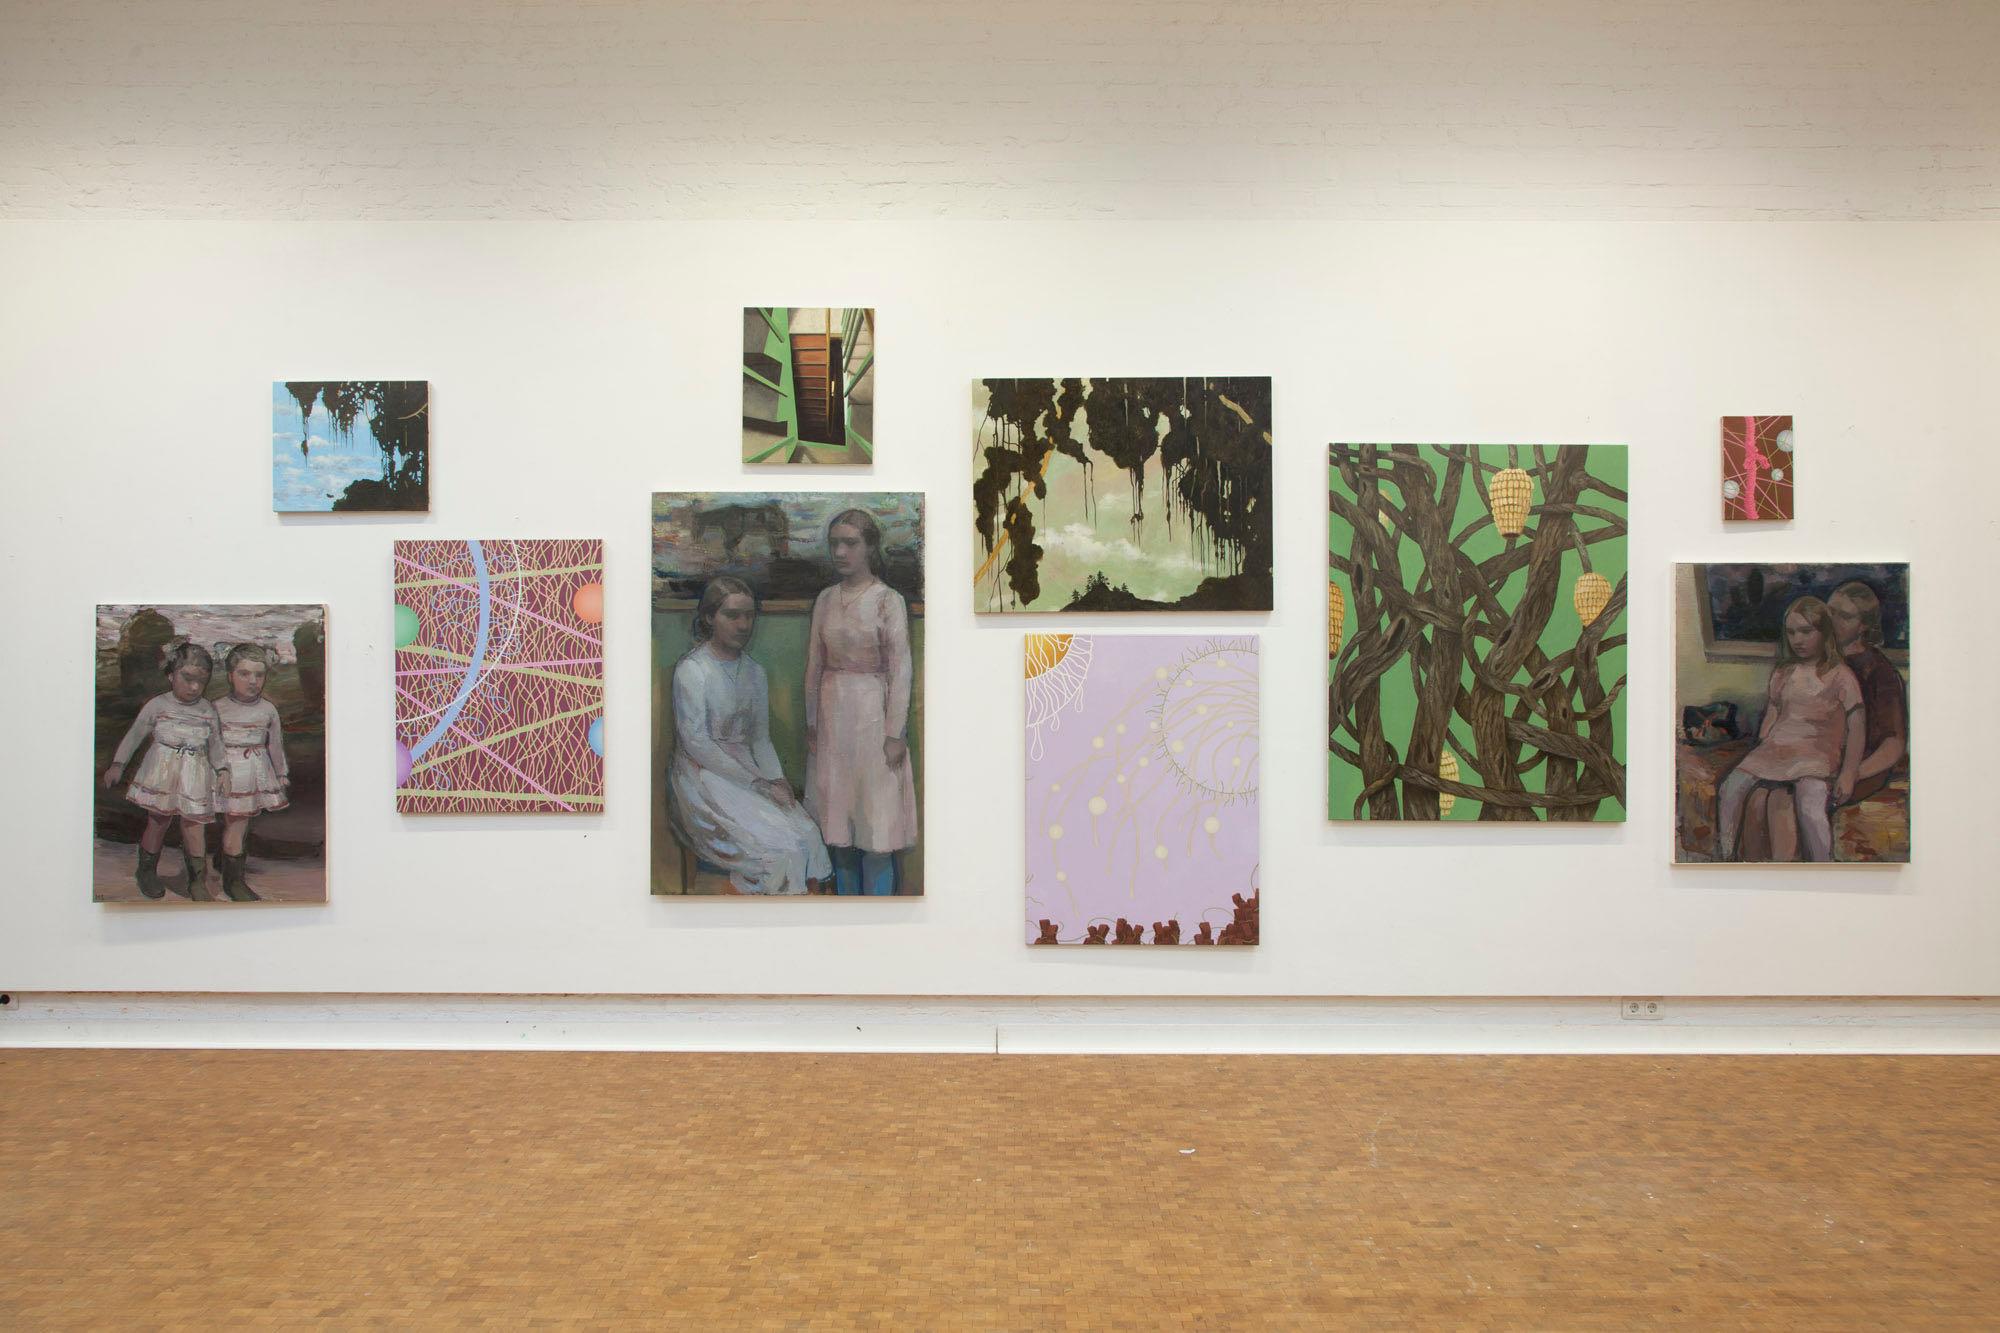 Sammenstilling, Nielsen/Svalheim/Nondal 2014